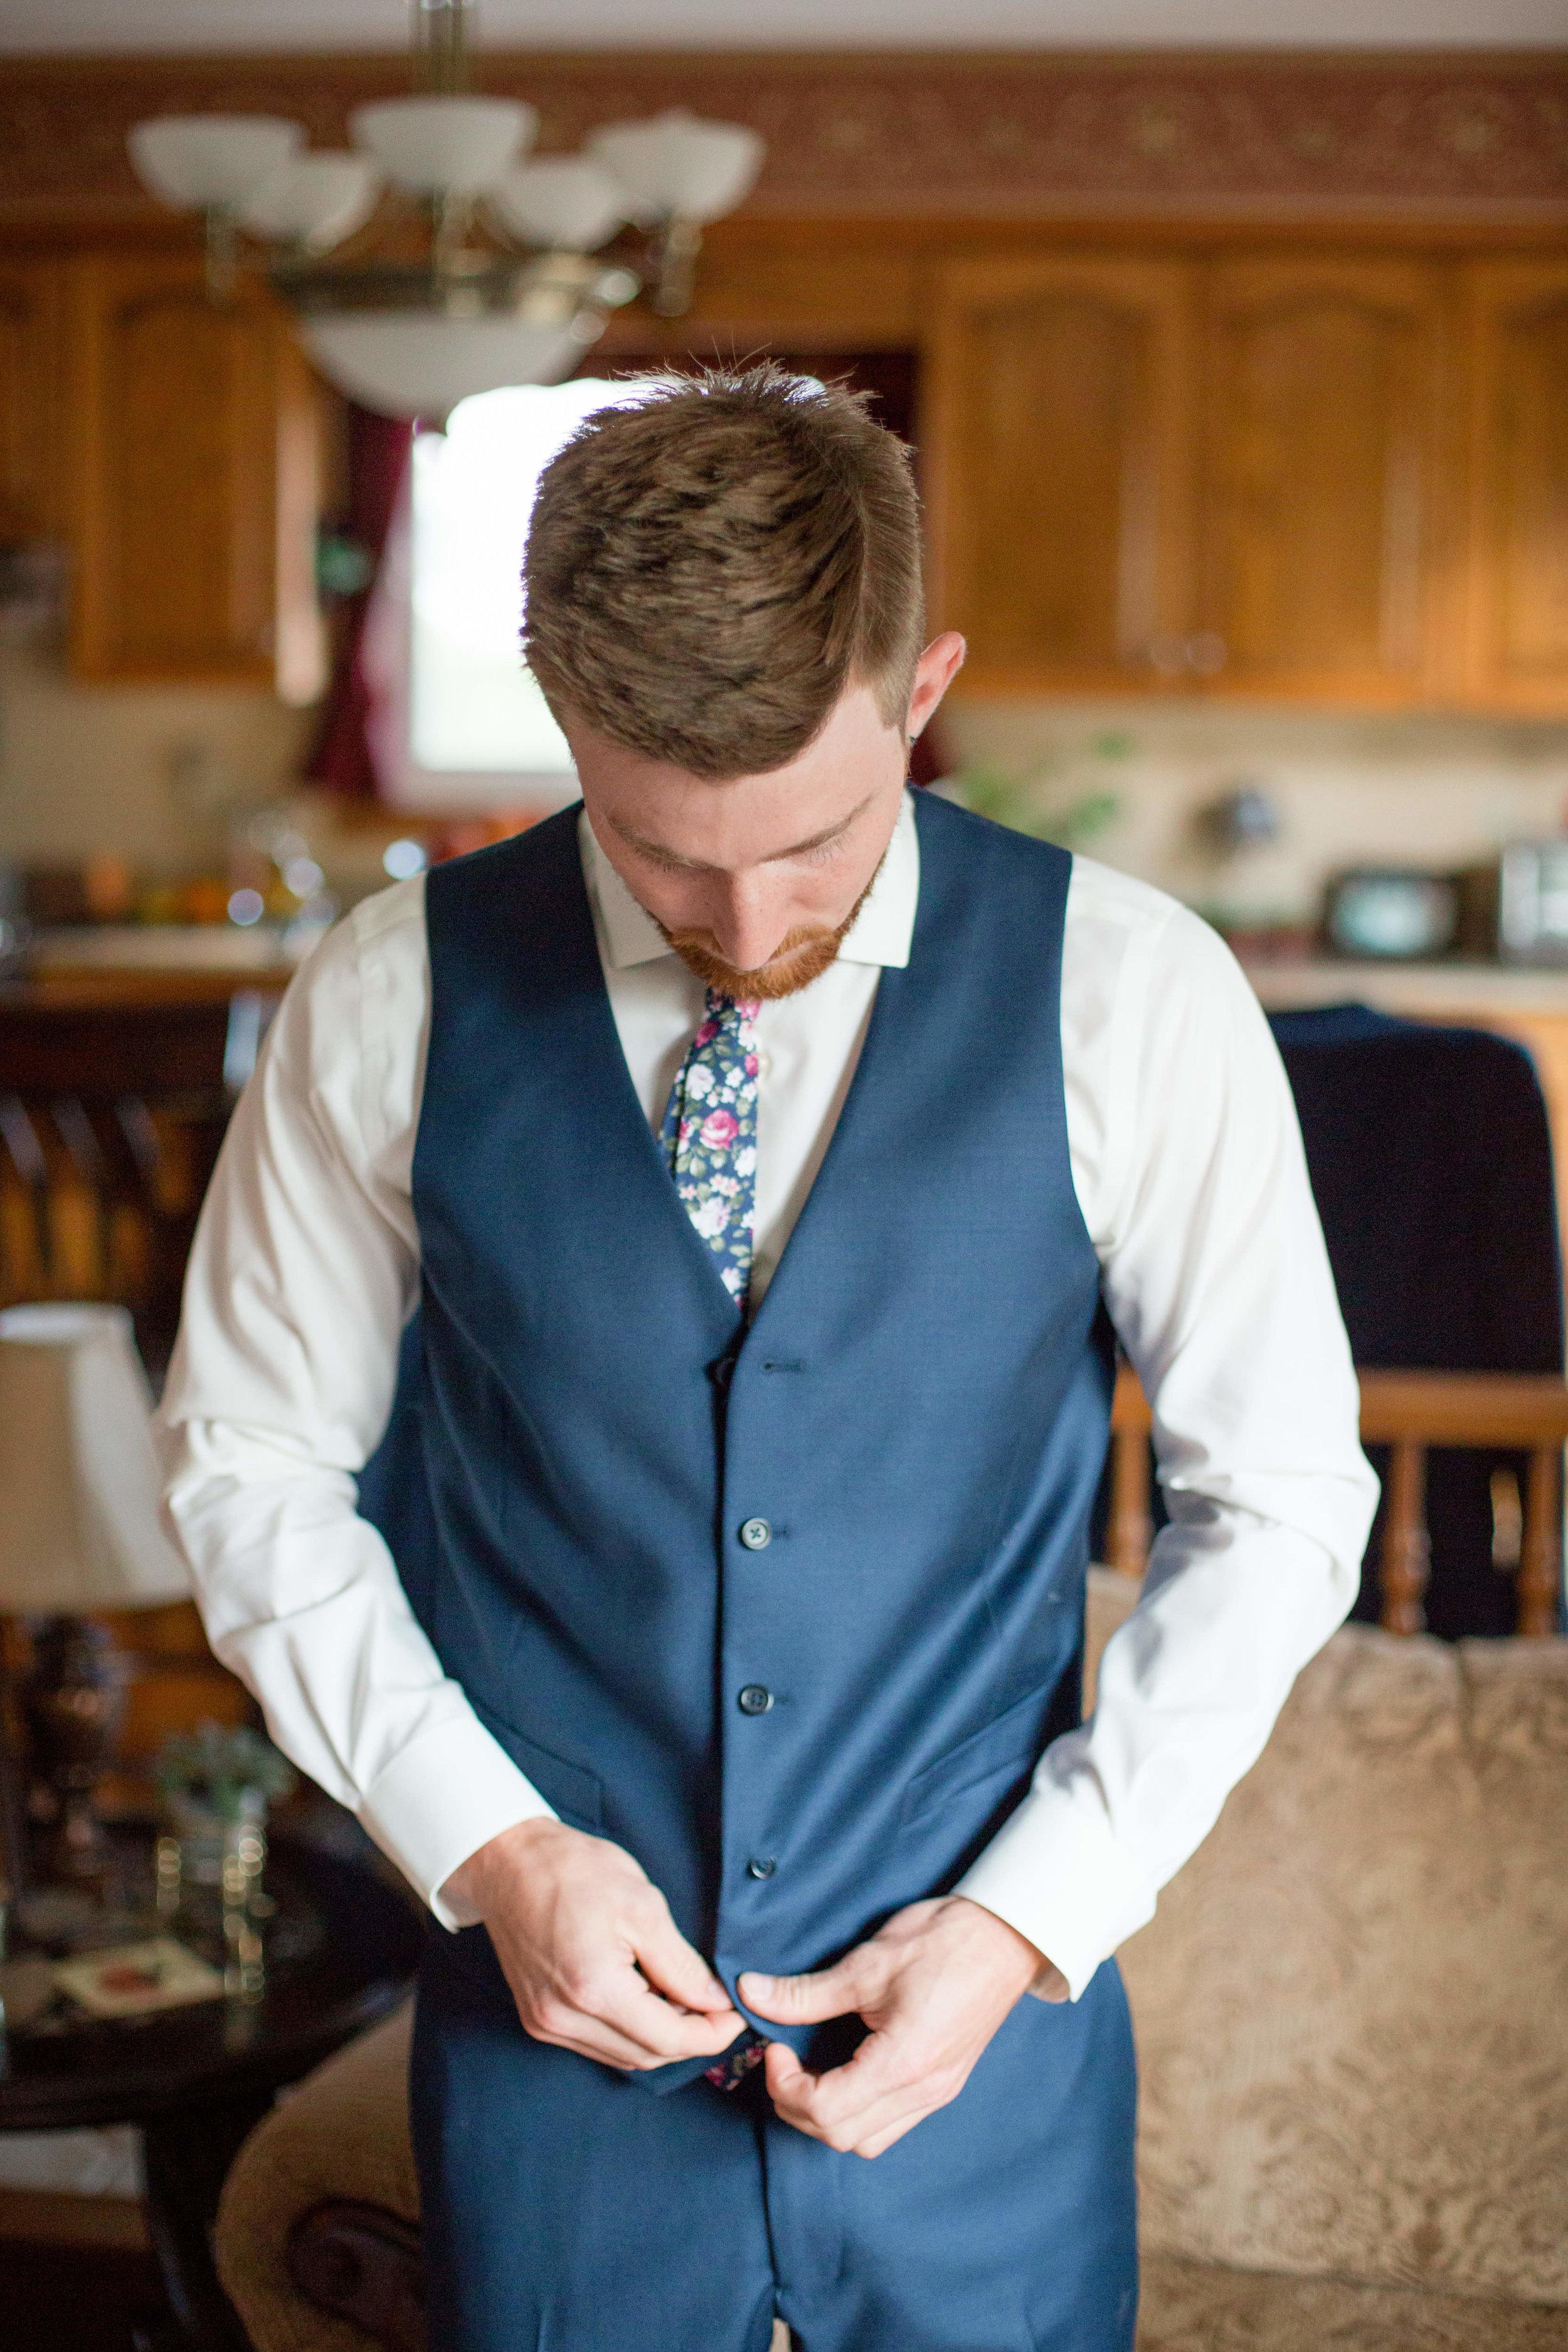 Maddy___Brandon___Daniel_Ricci_Weddings_High_Res._Finals_51.jpg